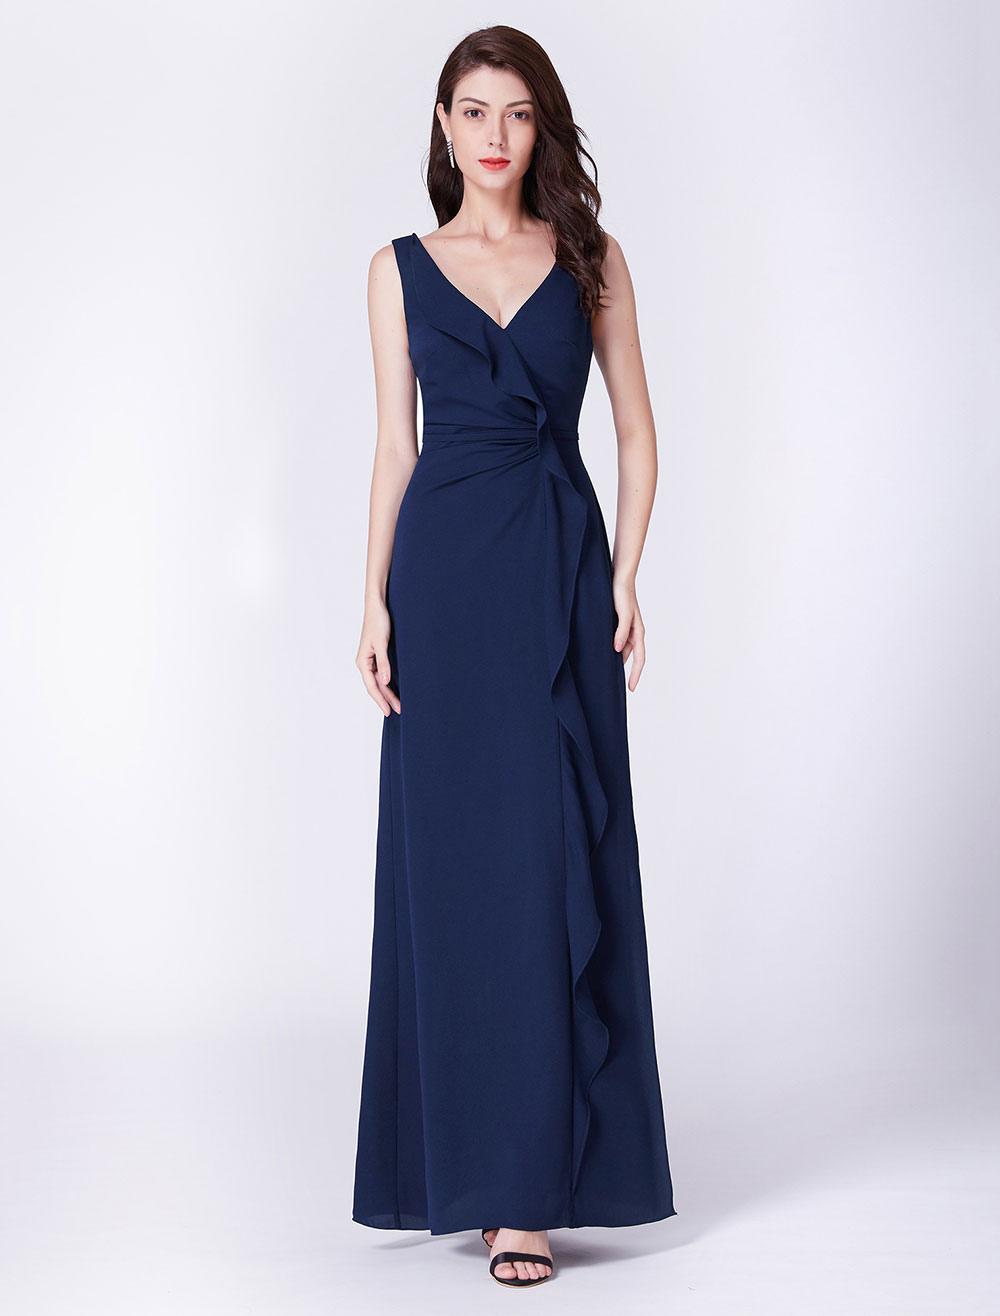 bridesmaid dresses dark navy prom dress chiffon long cascading ruffles v  neck floor length formal dress